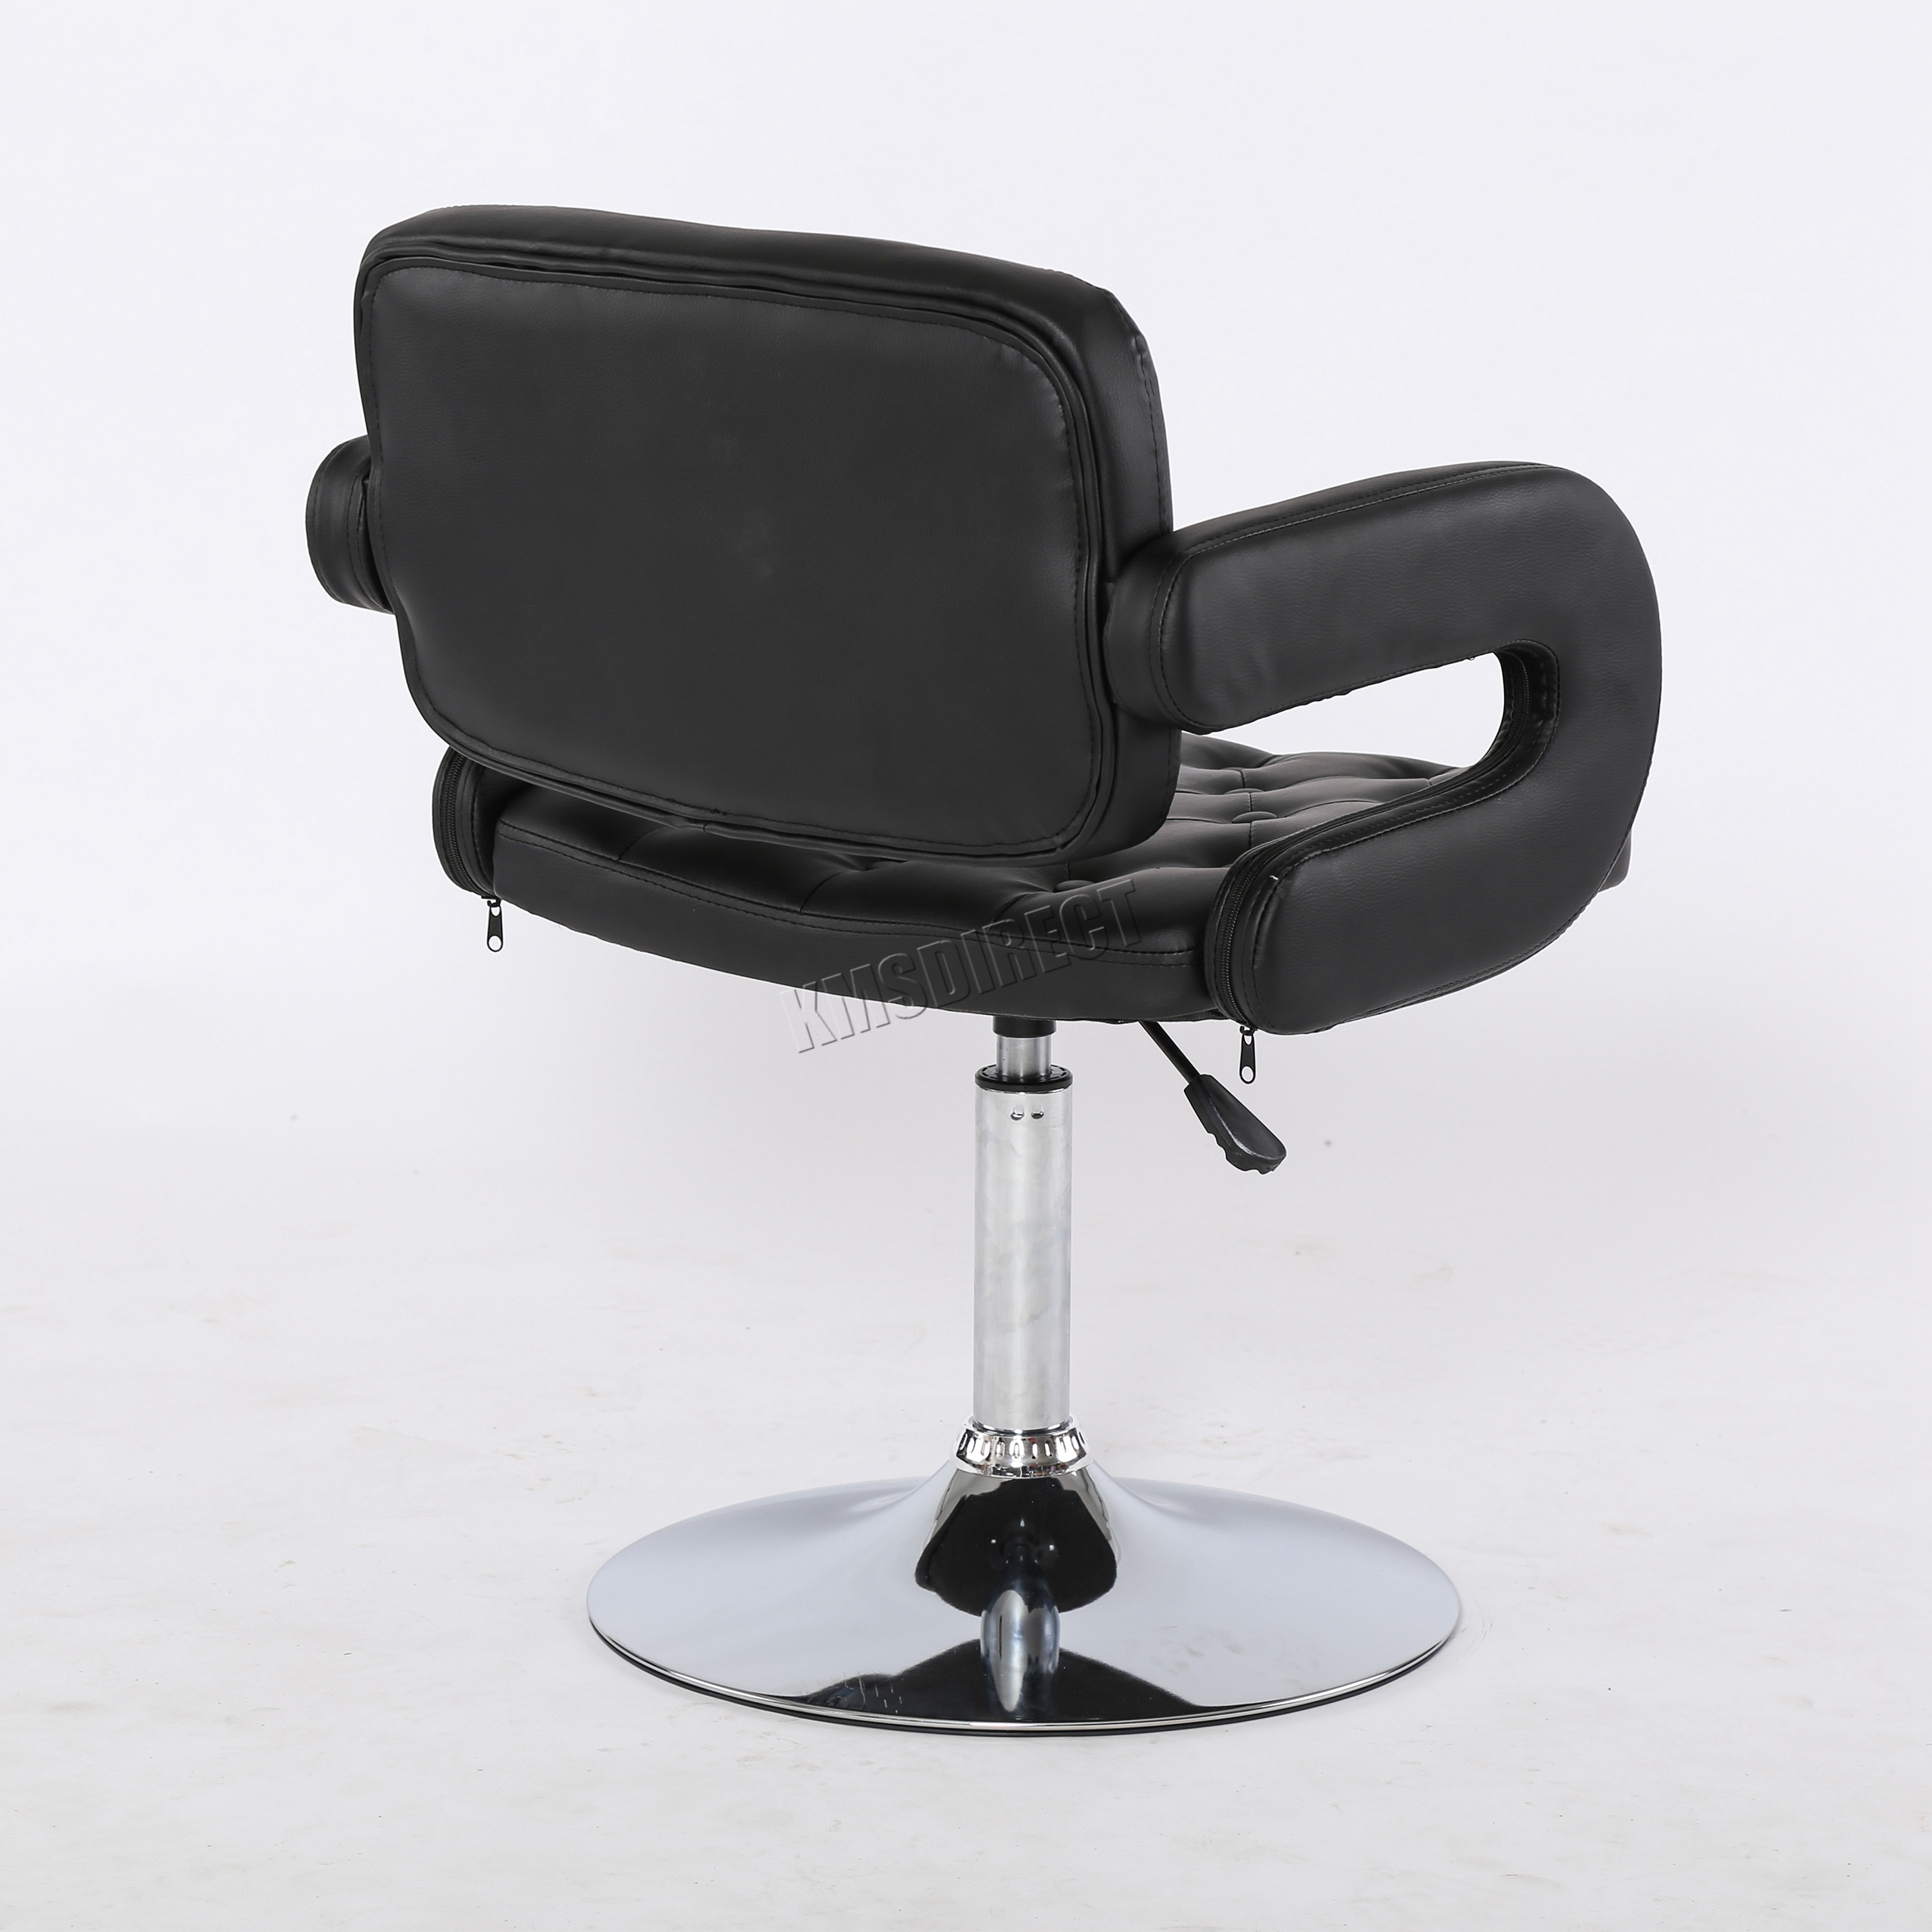 FoxHunter Beauty Salon Chair Barber Hairdressing Hair Cut PU